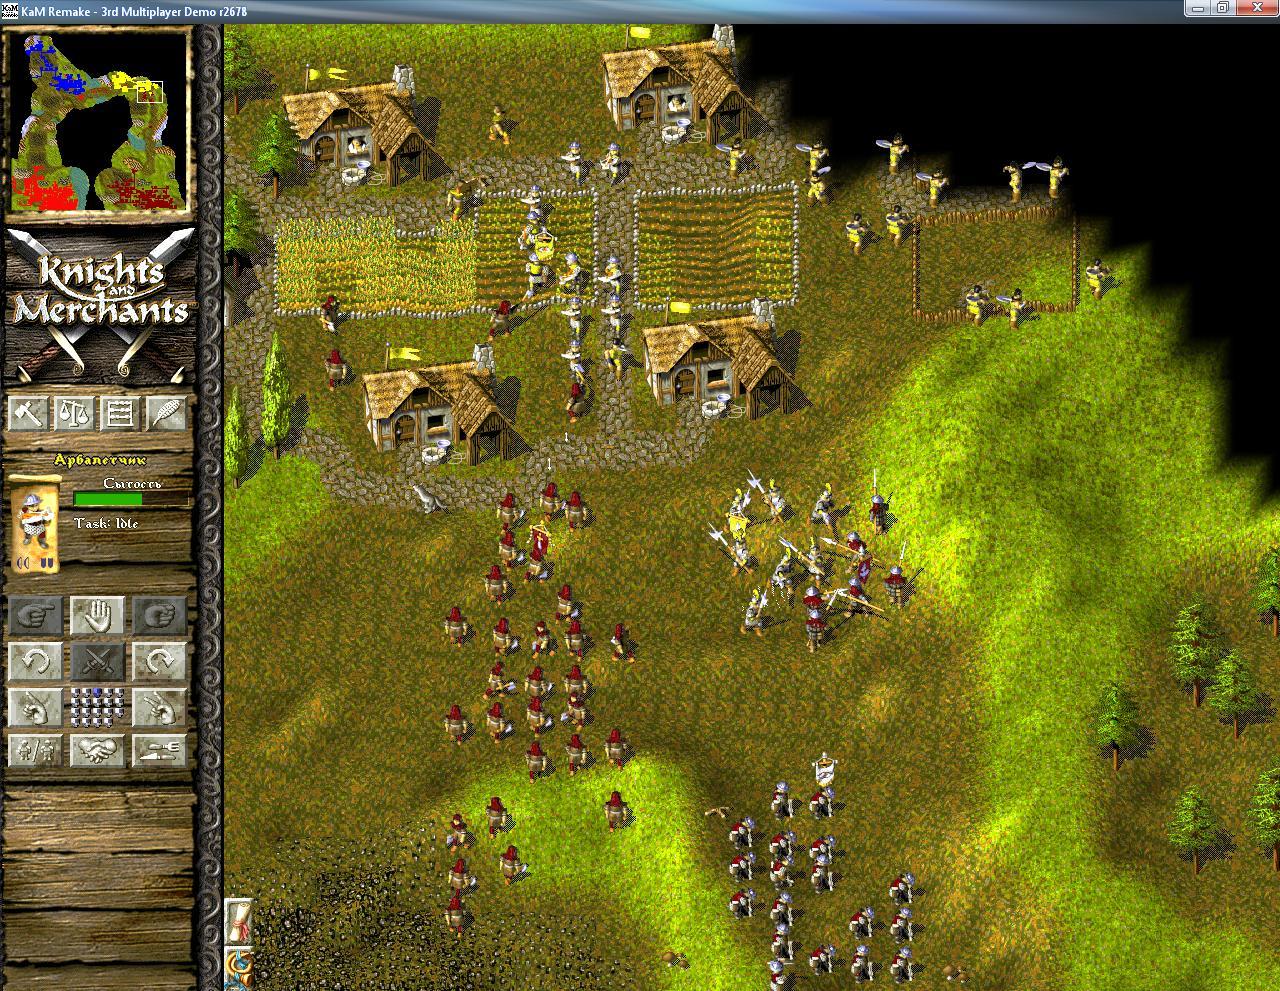 3.JPG - Knights & Merchants: The Peasants Rebellion